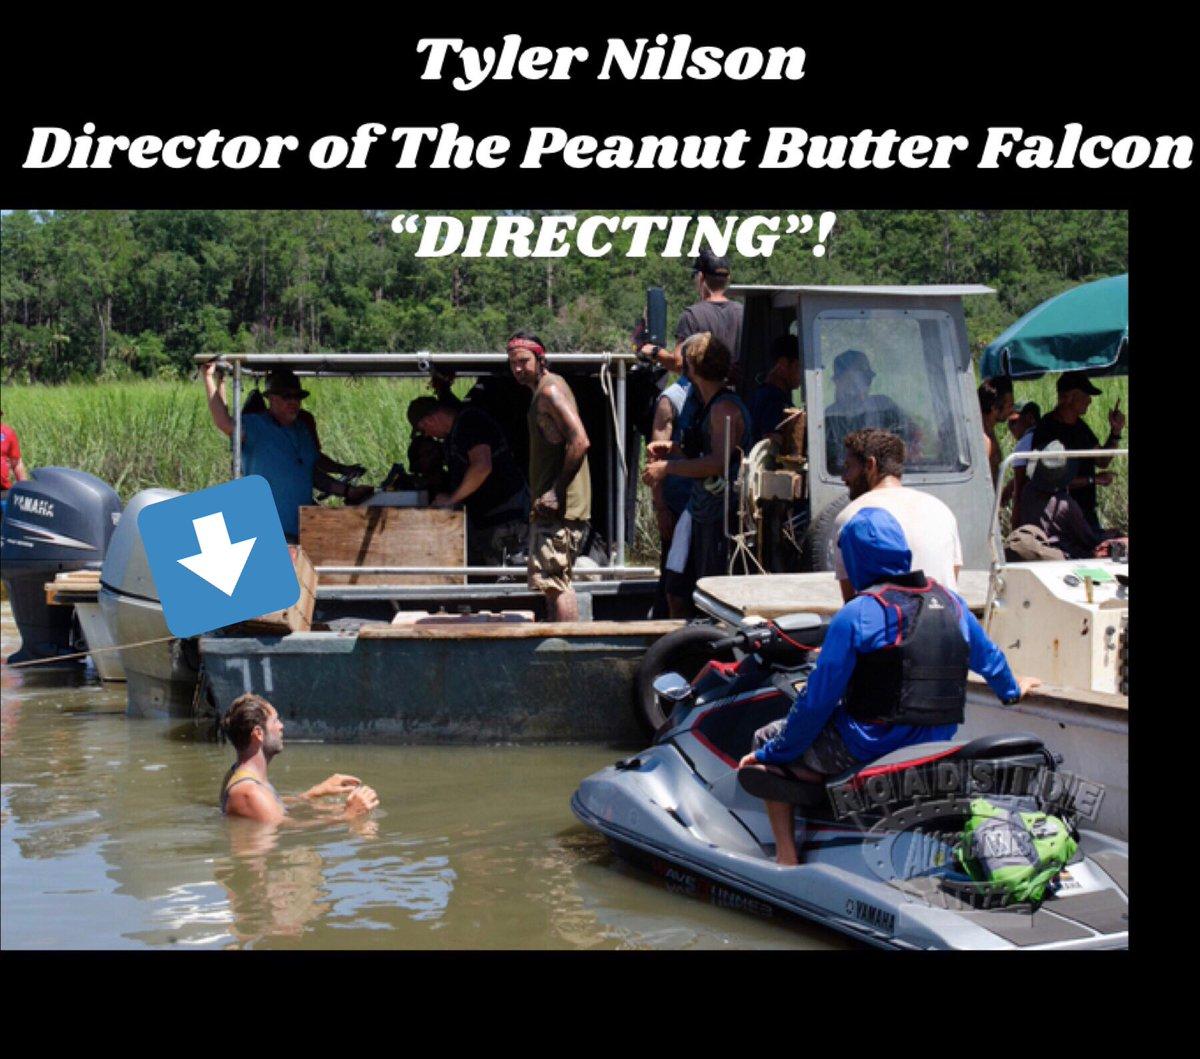 "test Twitter Media - Literally ""getting his feet wet"" in his first feature film‼️ @tpbfalcon @tylernilson @roadsidetweets #ShiaLaBeouf #DakotaJohnson #ZackGottsagen #ThePeanutButterFalcon @LuckyTreehouse @GDSFoundation https://t.co/vJPSd2Um54"